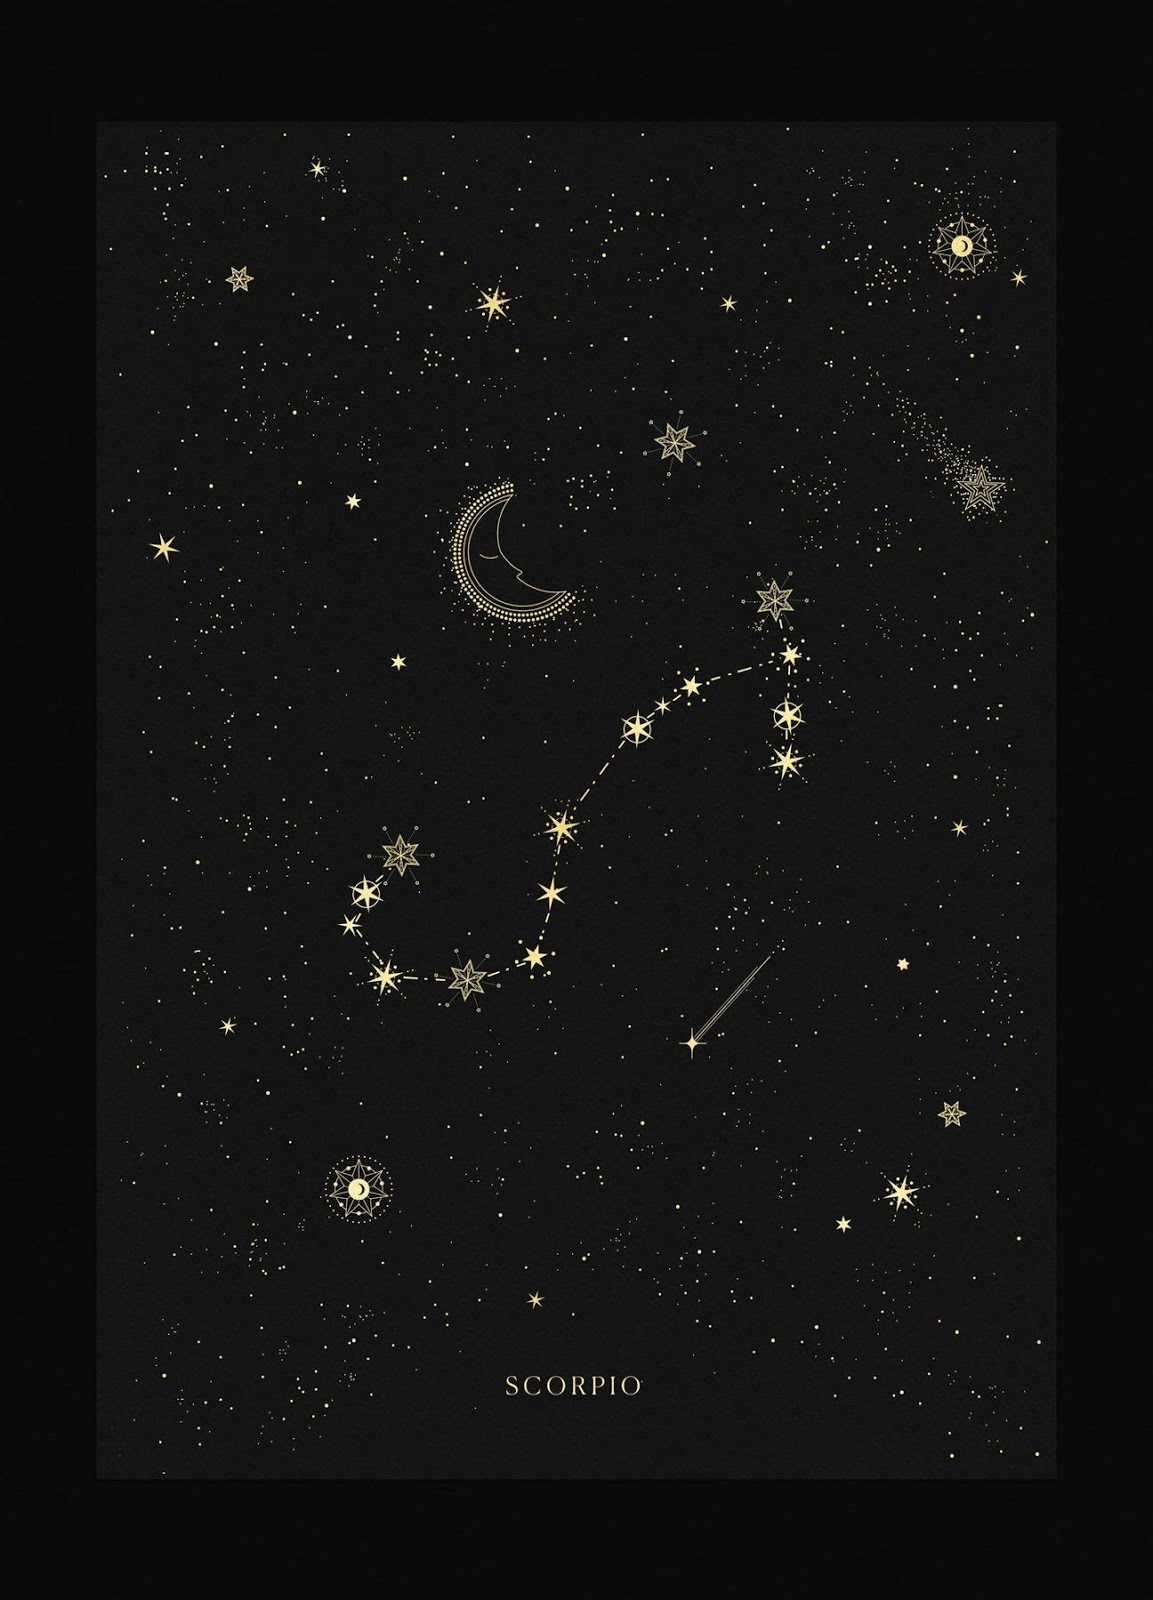 Scorpio Zodiac Horoscope Constellation Sign Symbol Tattoo (228)